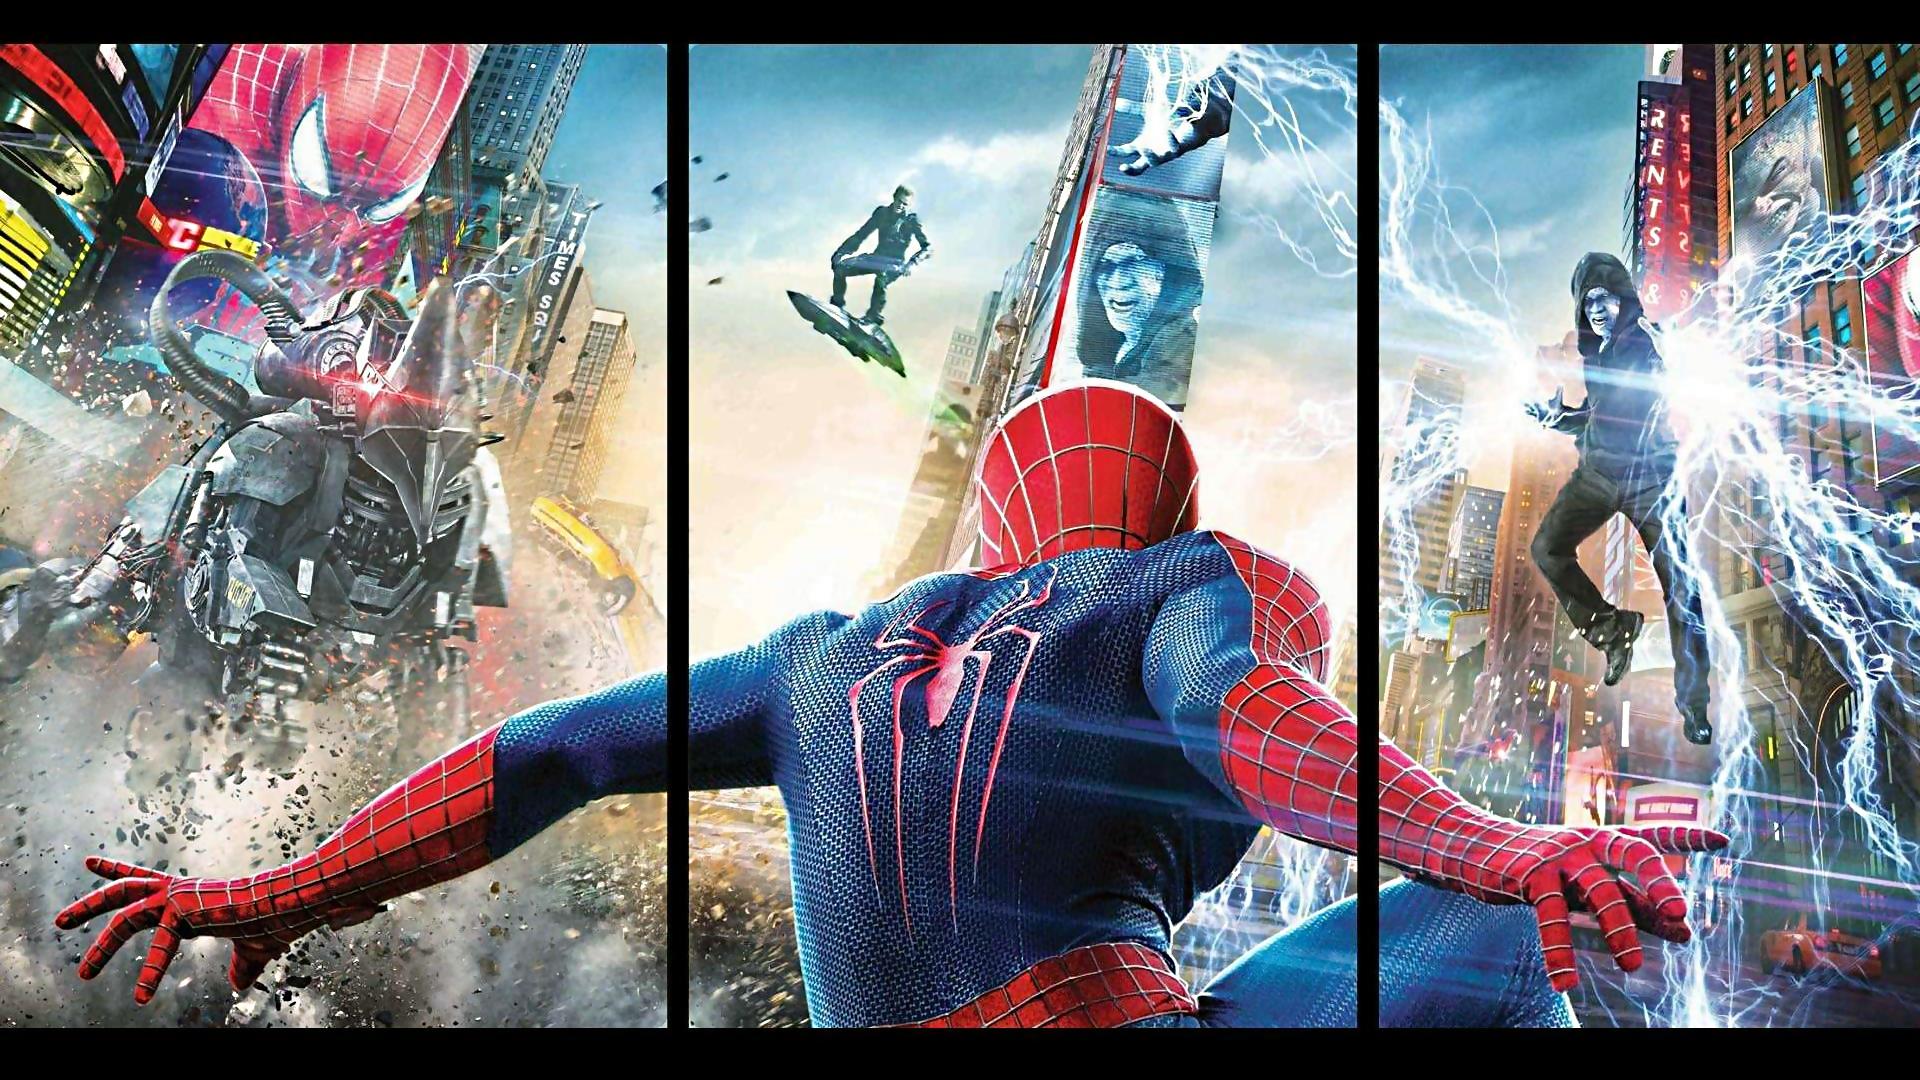 Amazing Spiderman Symbol Wallpaper Images Free Download 1920x1080